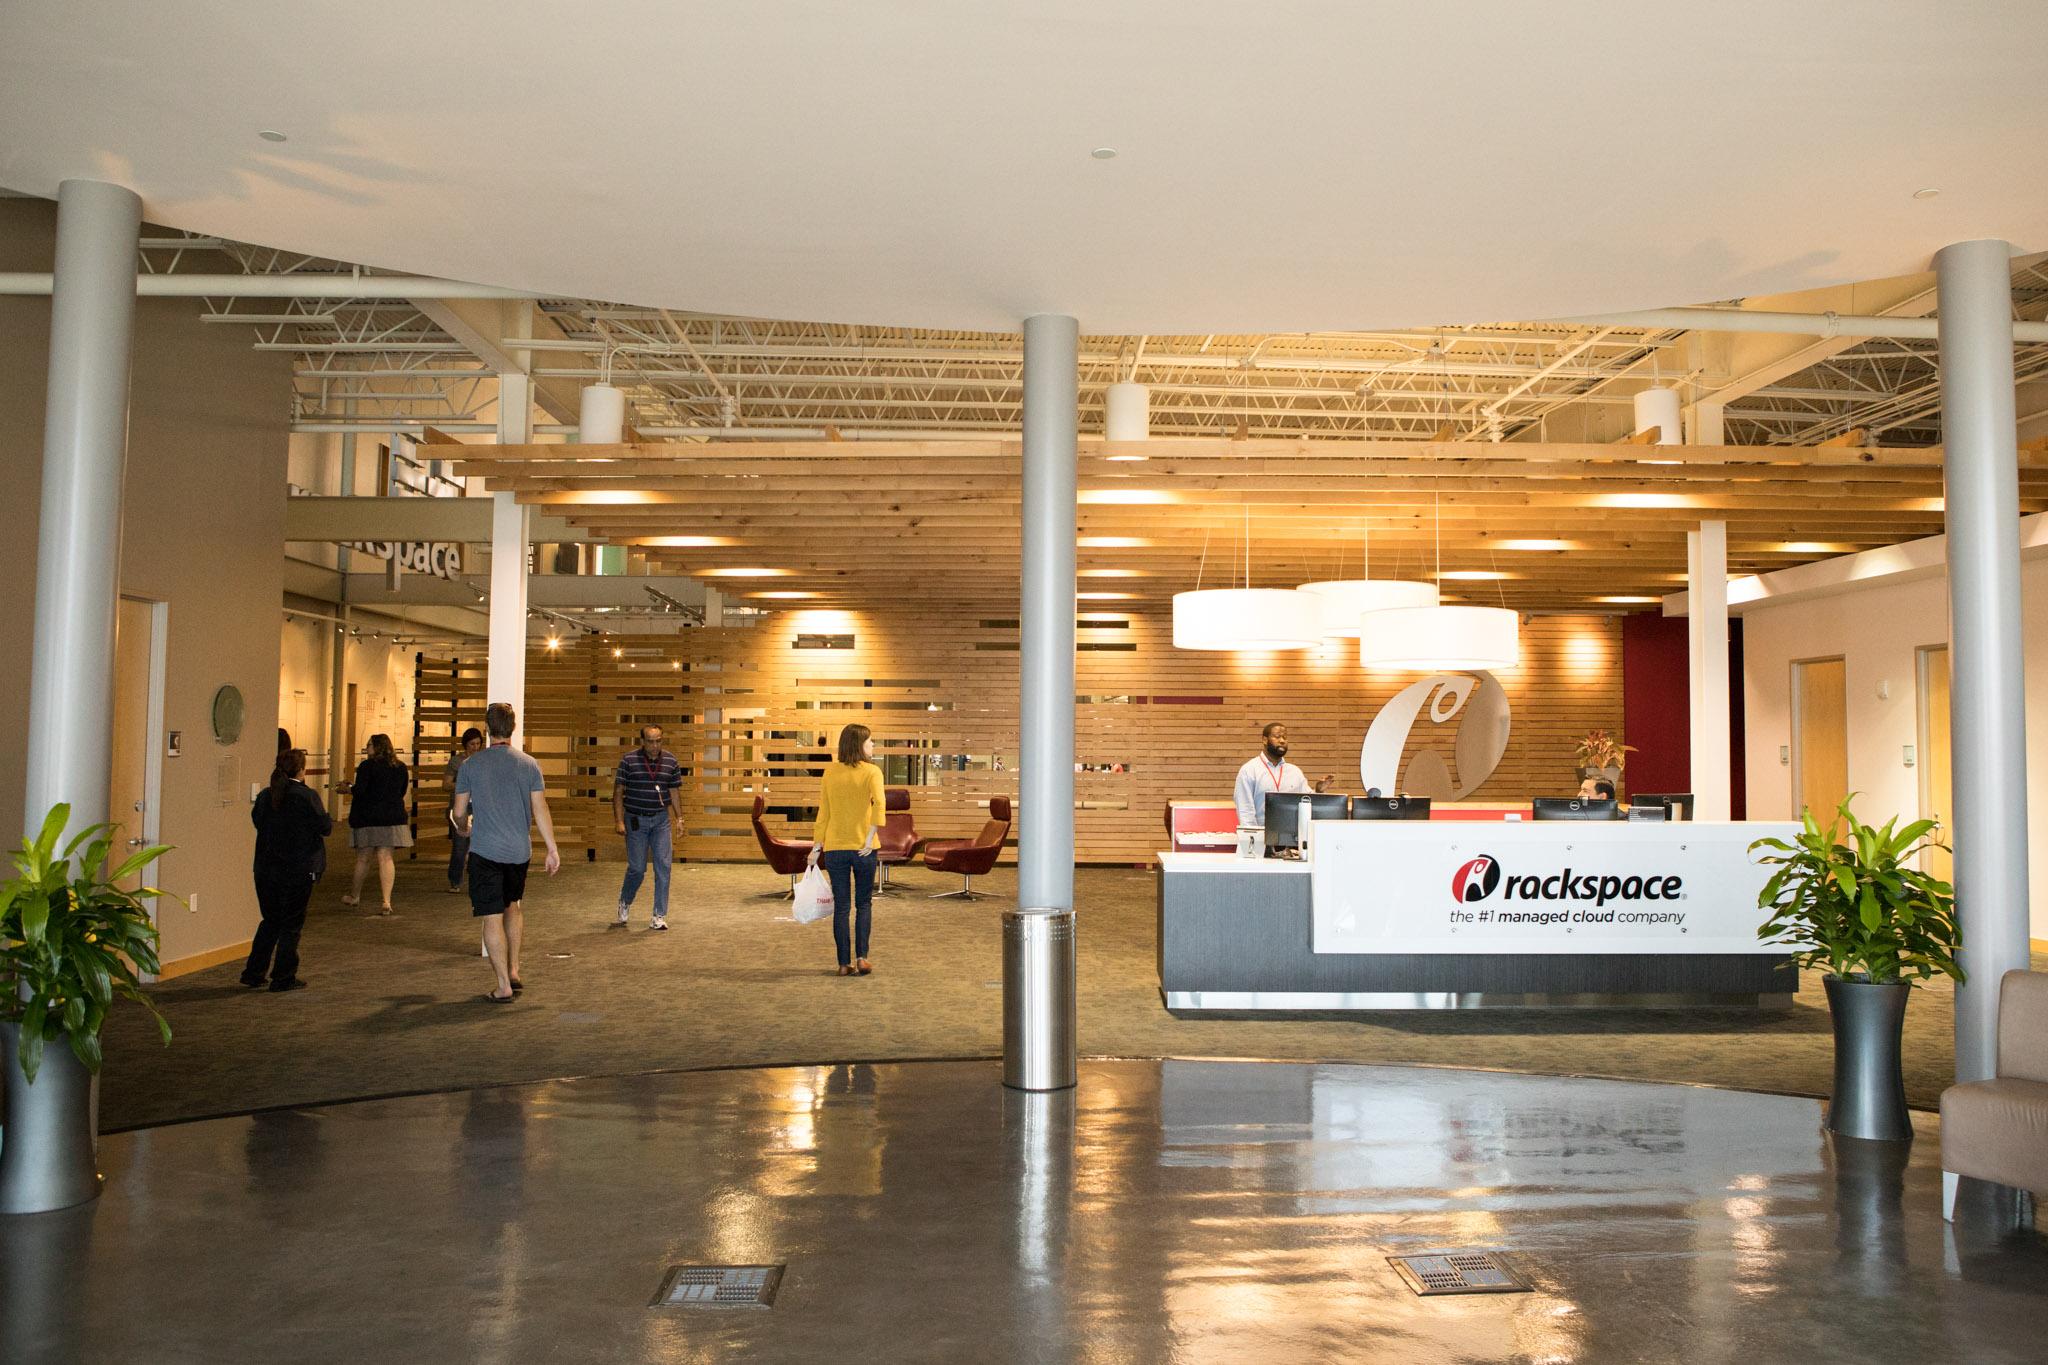 Employees of Rackspace walk through the main lobby.